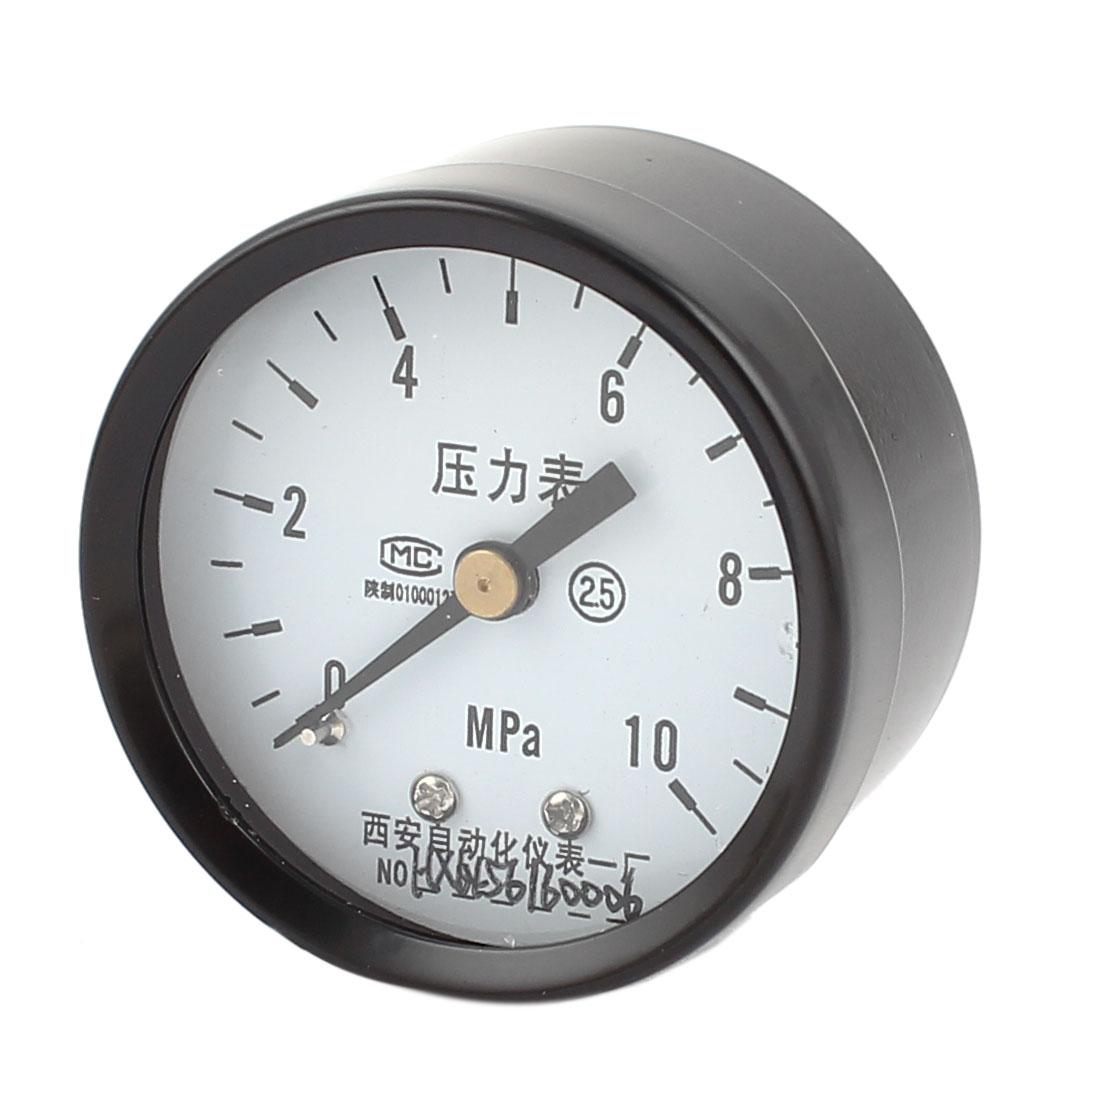 Universal 0-10MPa Compressor Air Vacuum Pressure Meter Gauge 50mm